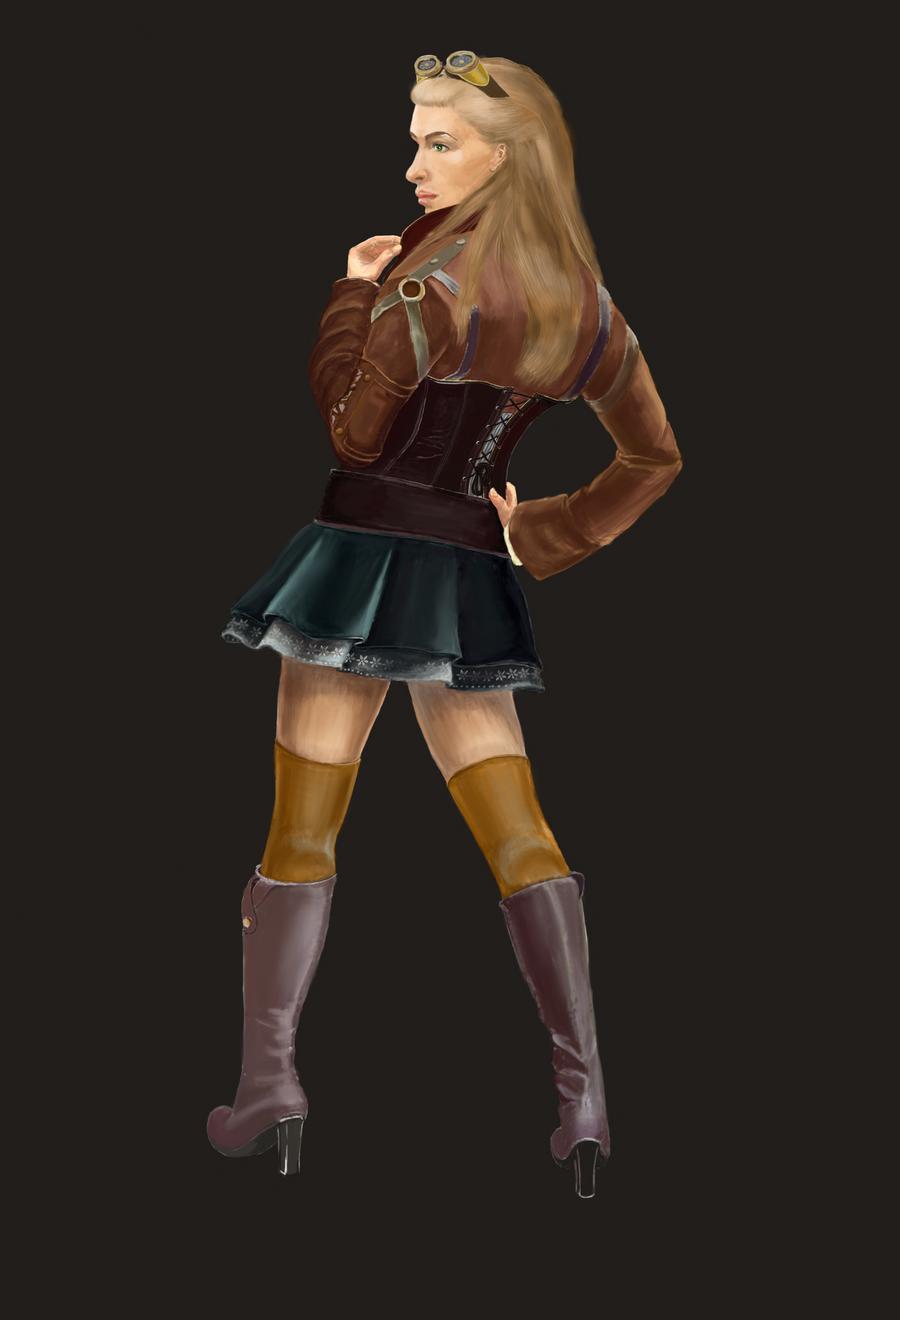 girl by Lilia-Anisimova